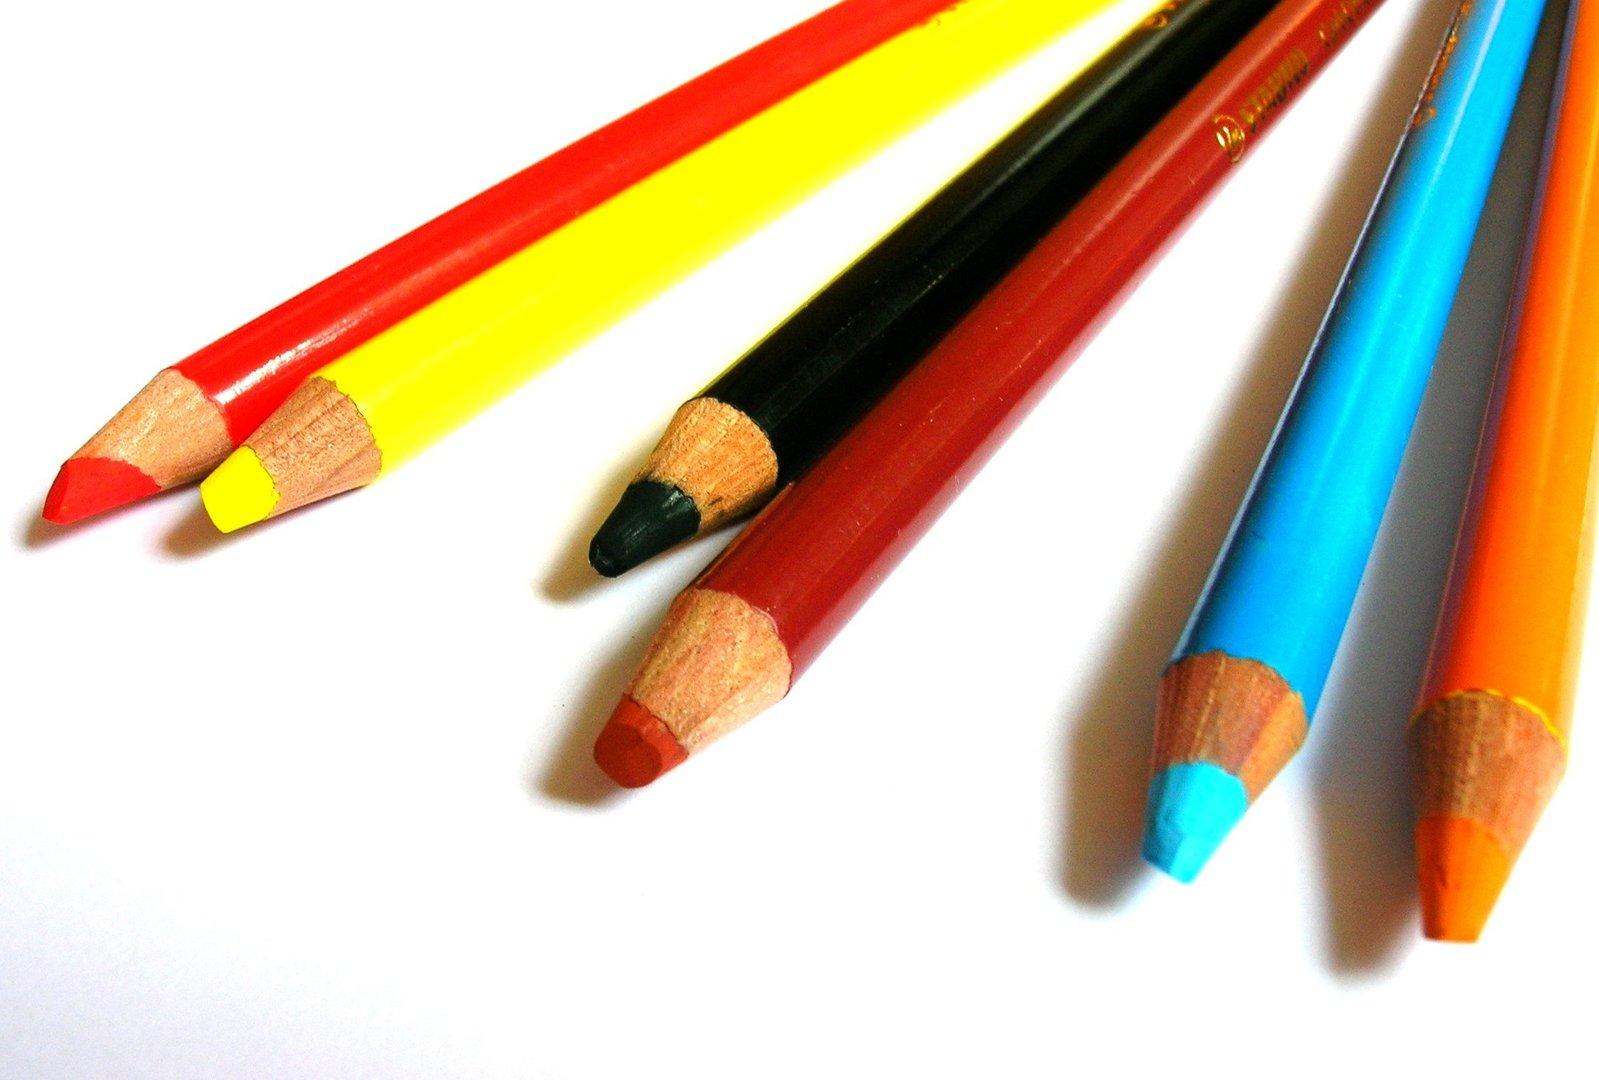 Free My Pencils 3 Stock Photo